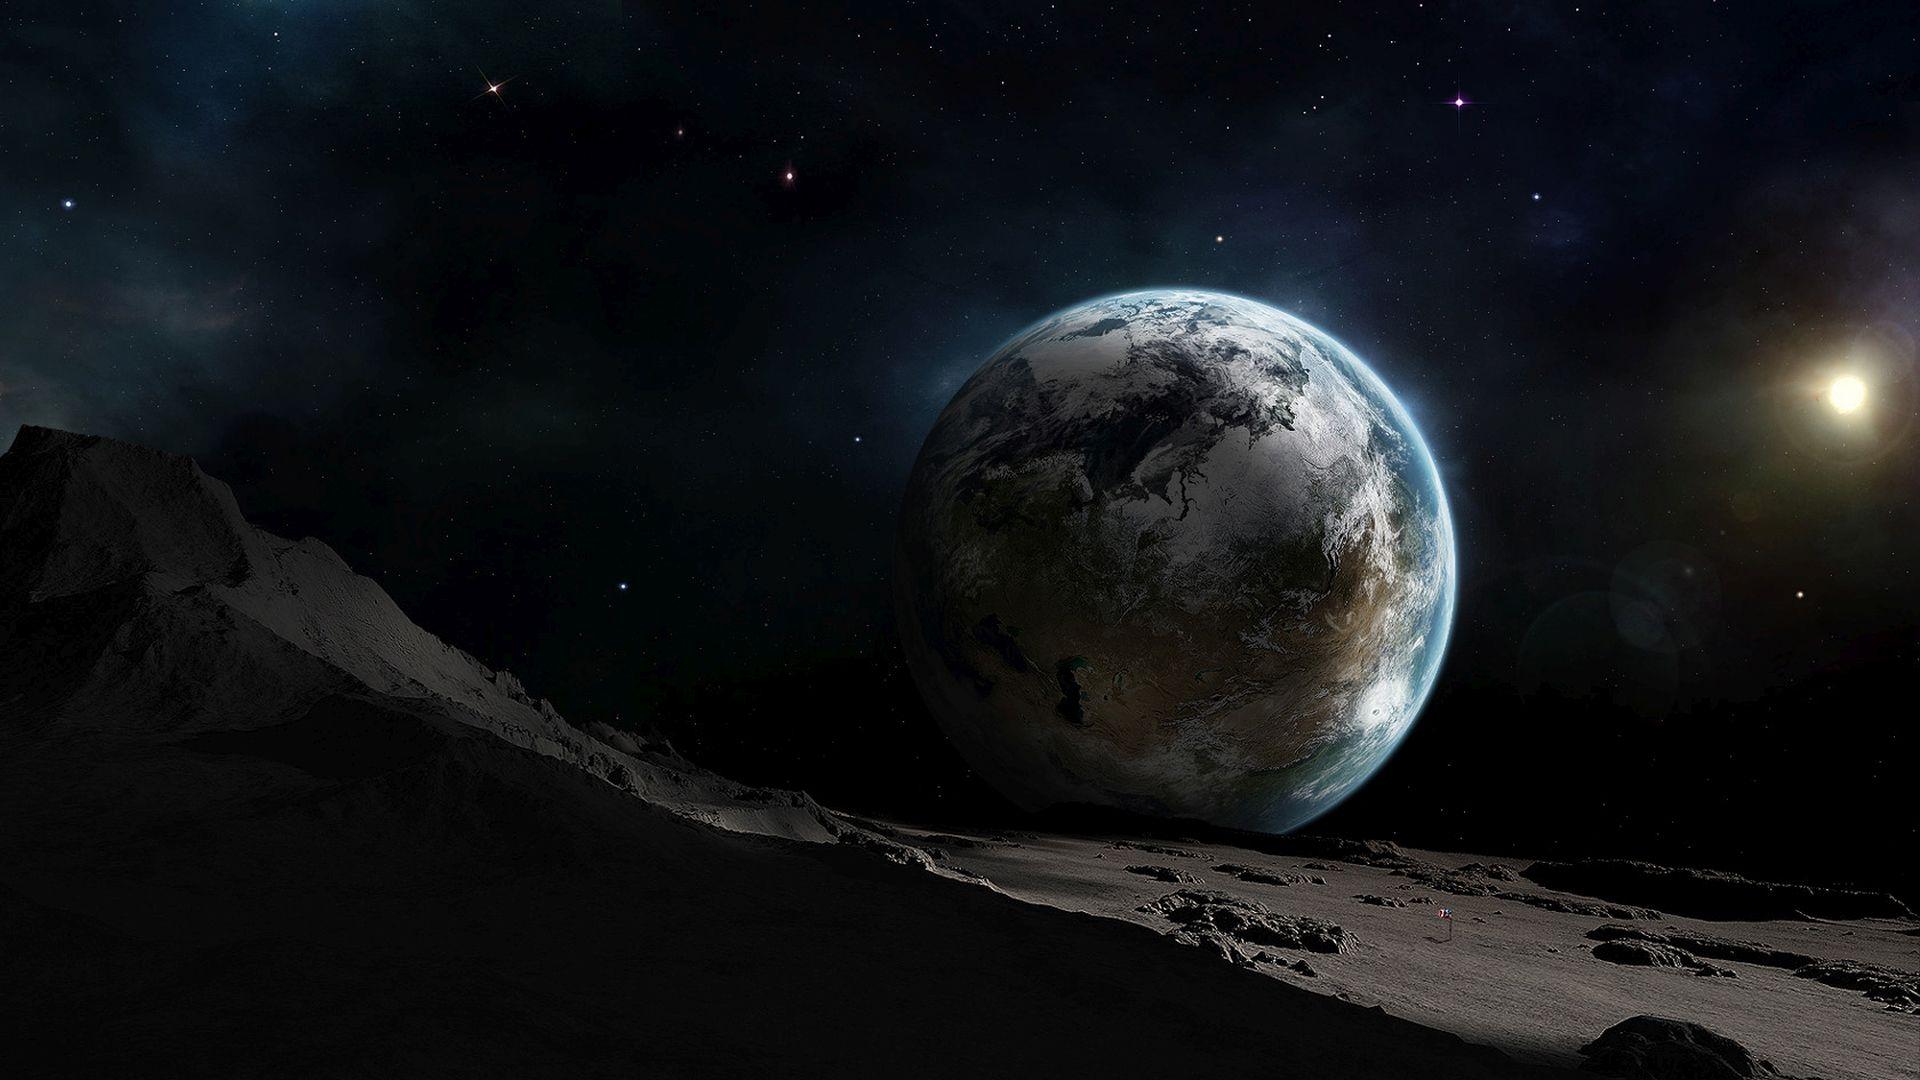 Terre vue de la lune Fond d'écran - Fond d'écran HD